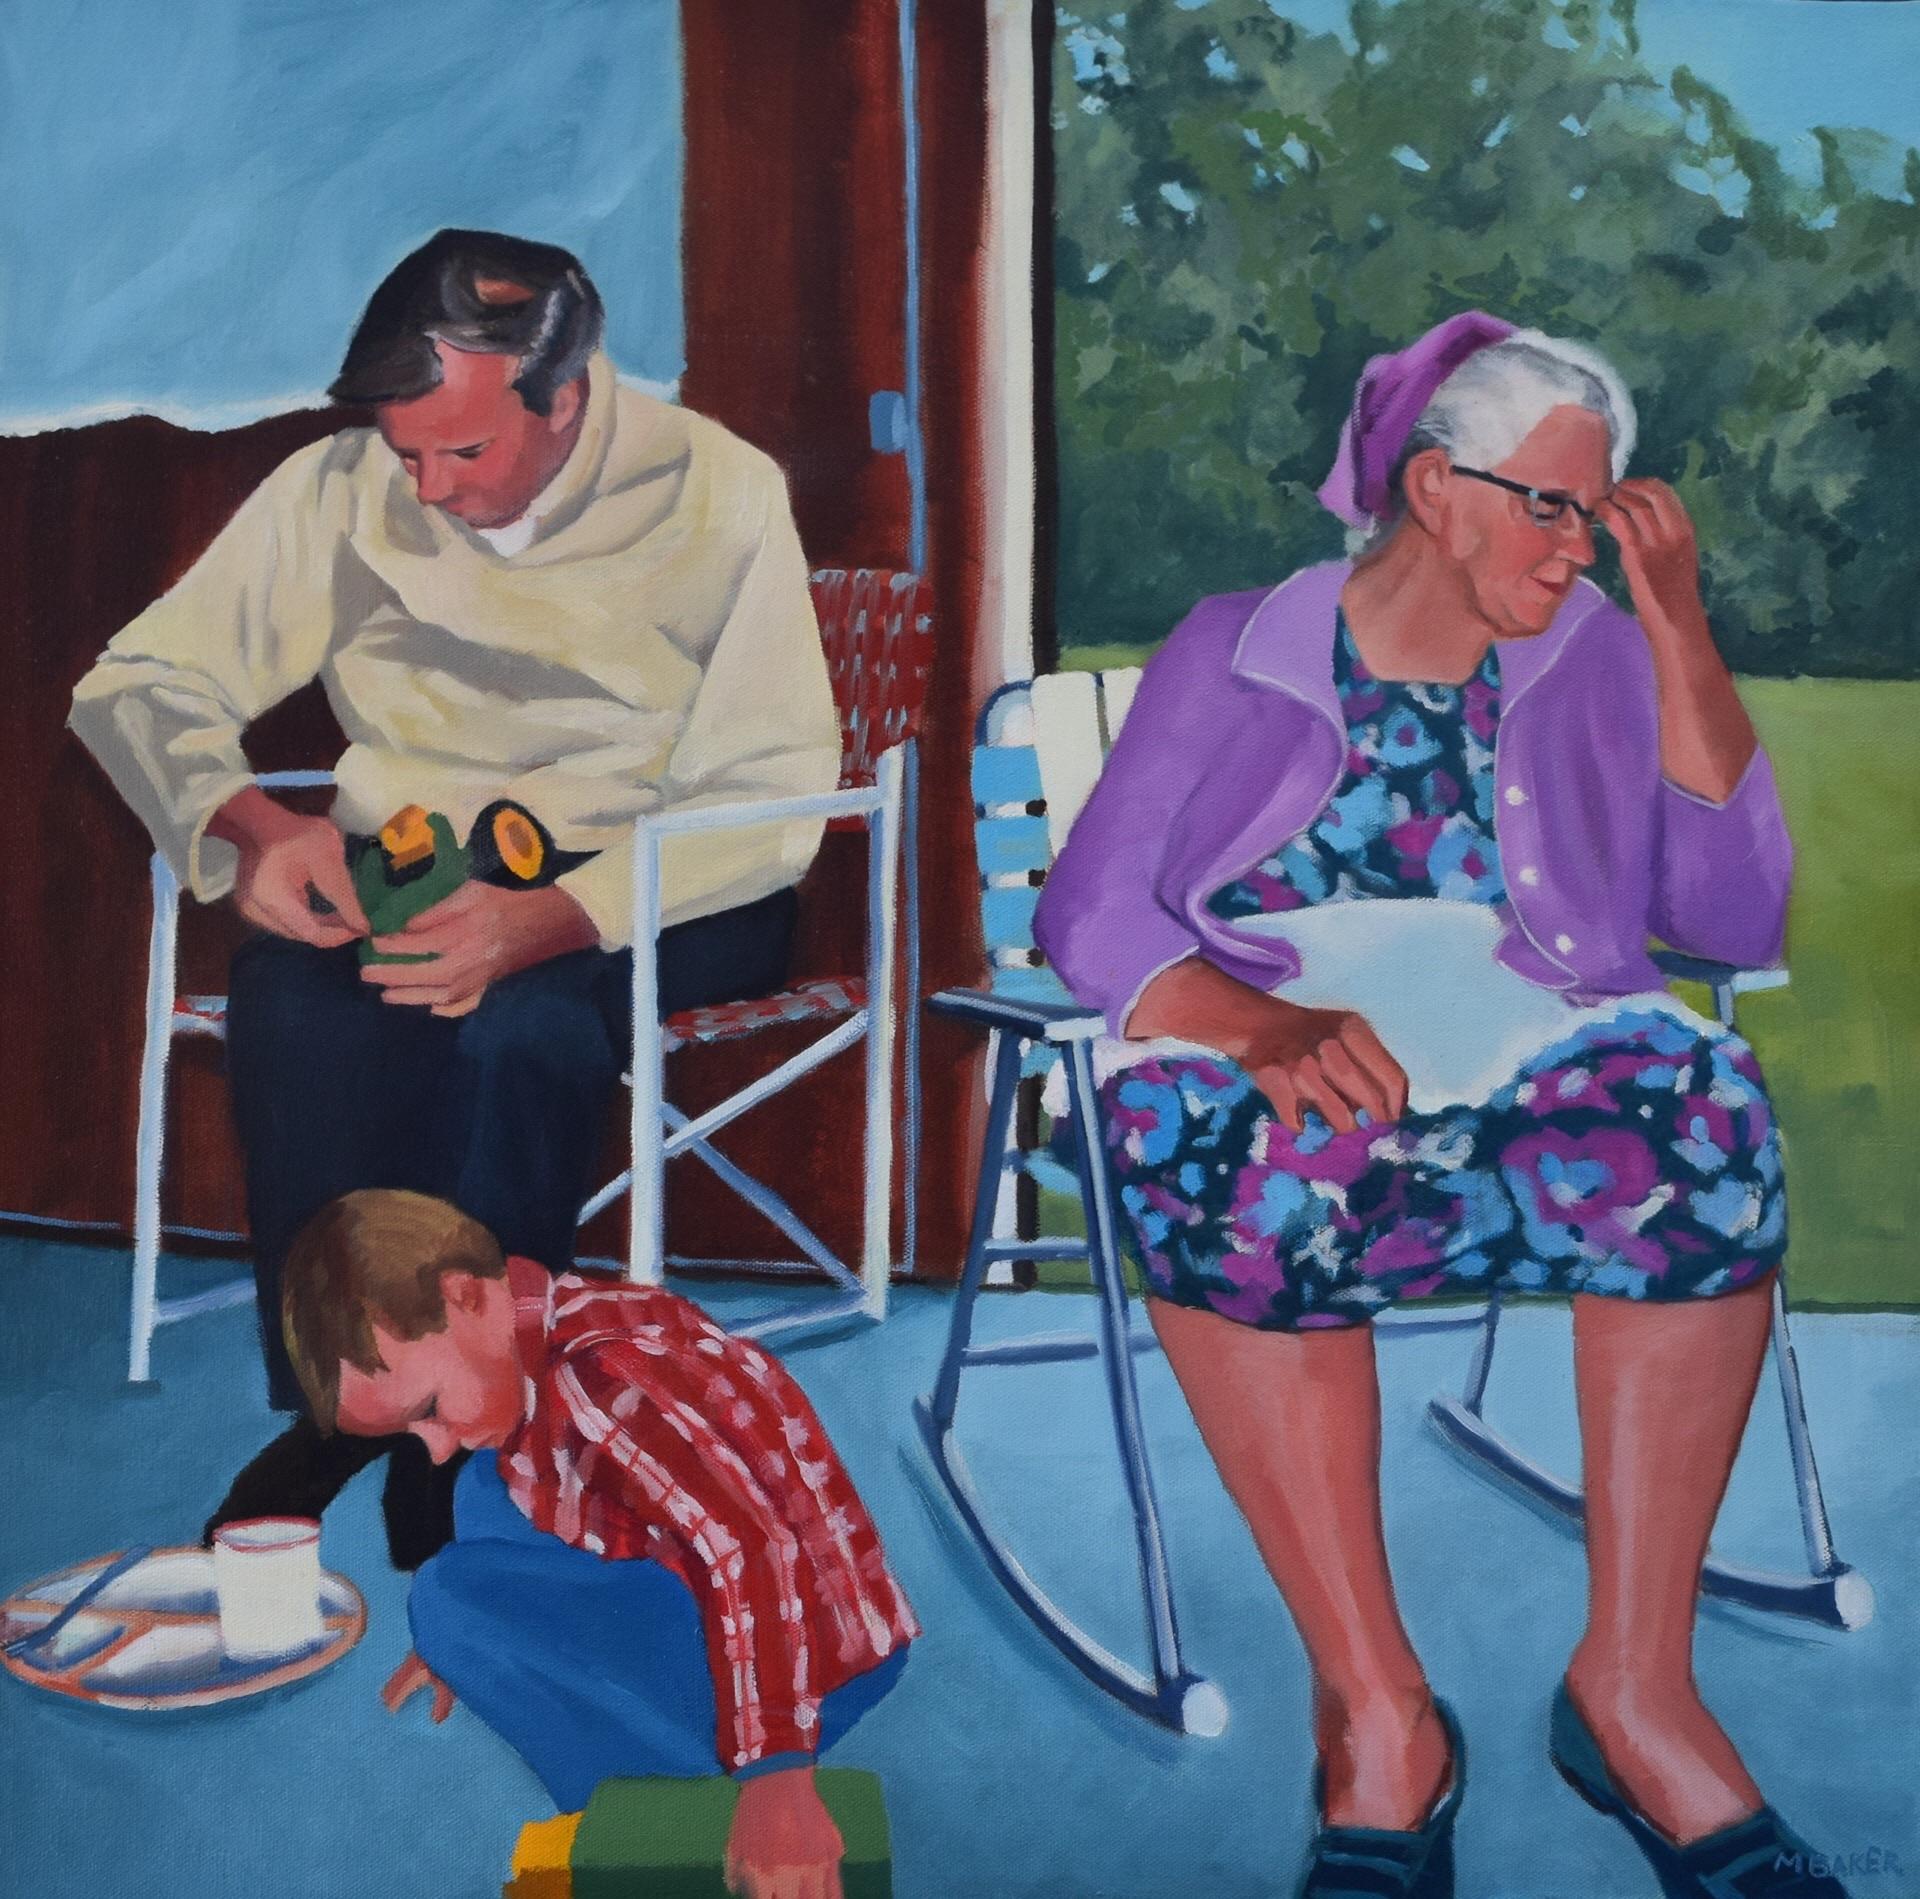 Baker,Margaret-Toytruck-24x24 inch oil on canvas.jpg